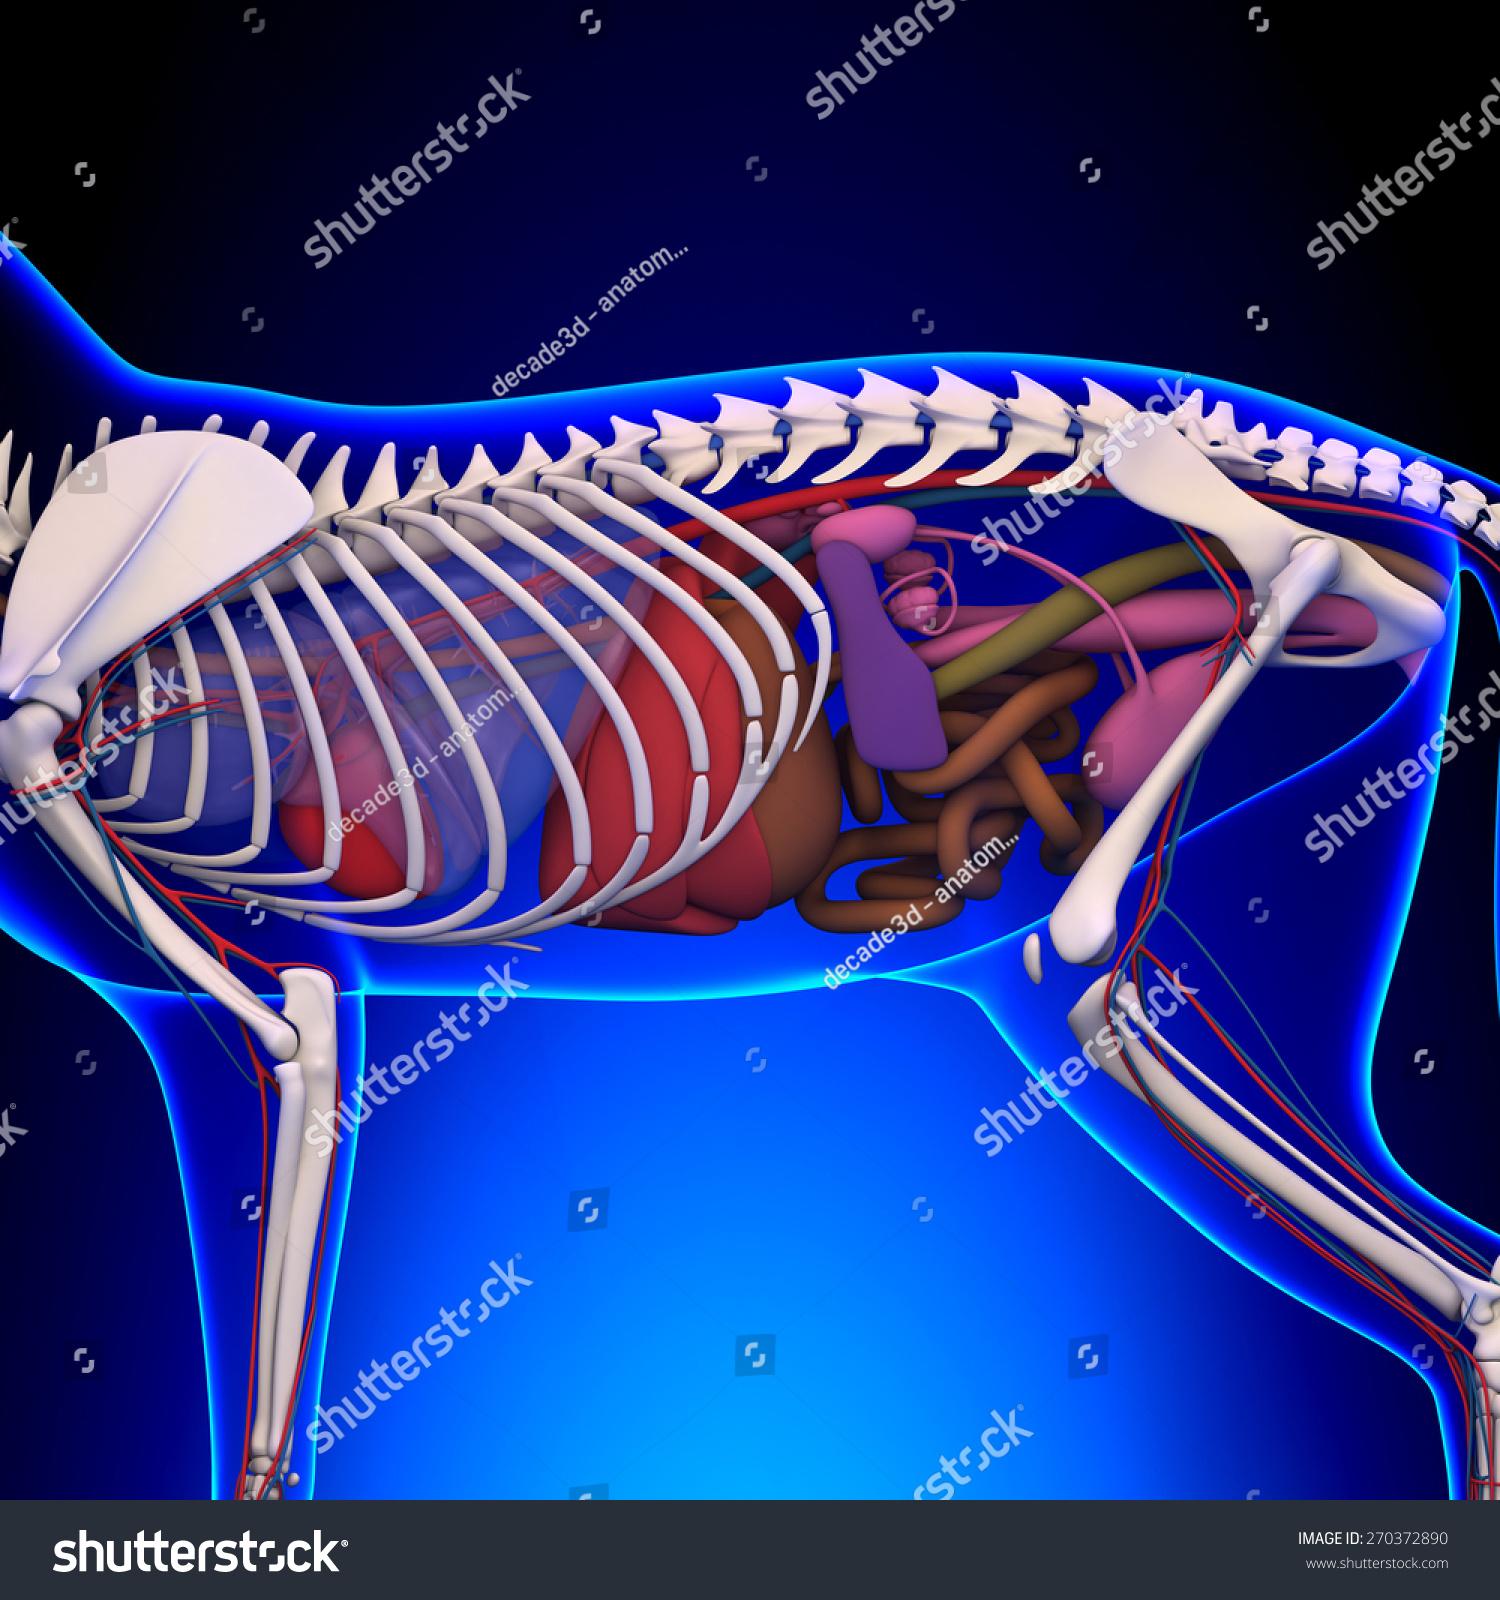 Cat Internal Organs Anatomy Skeleton Stock Illustration 270372890 ...